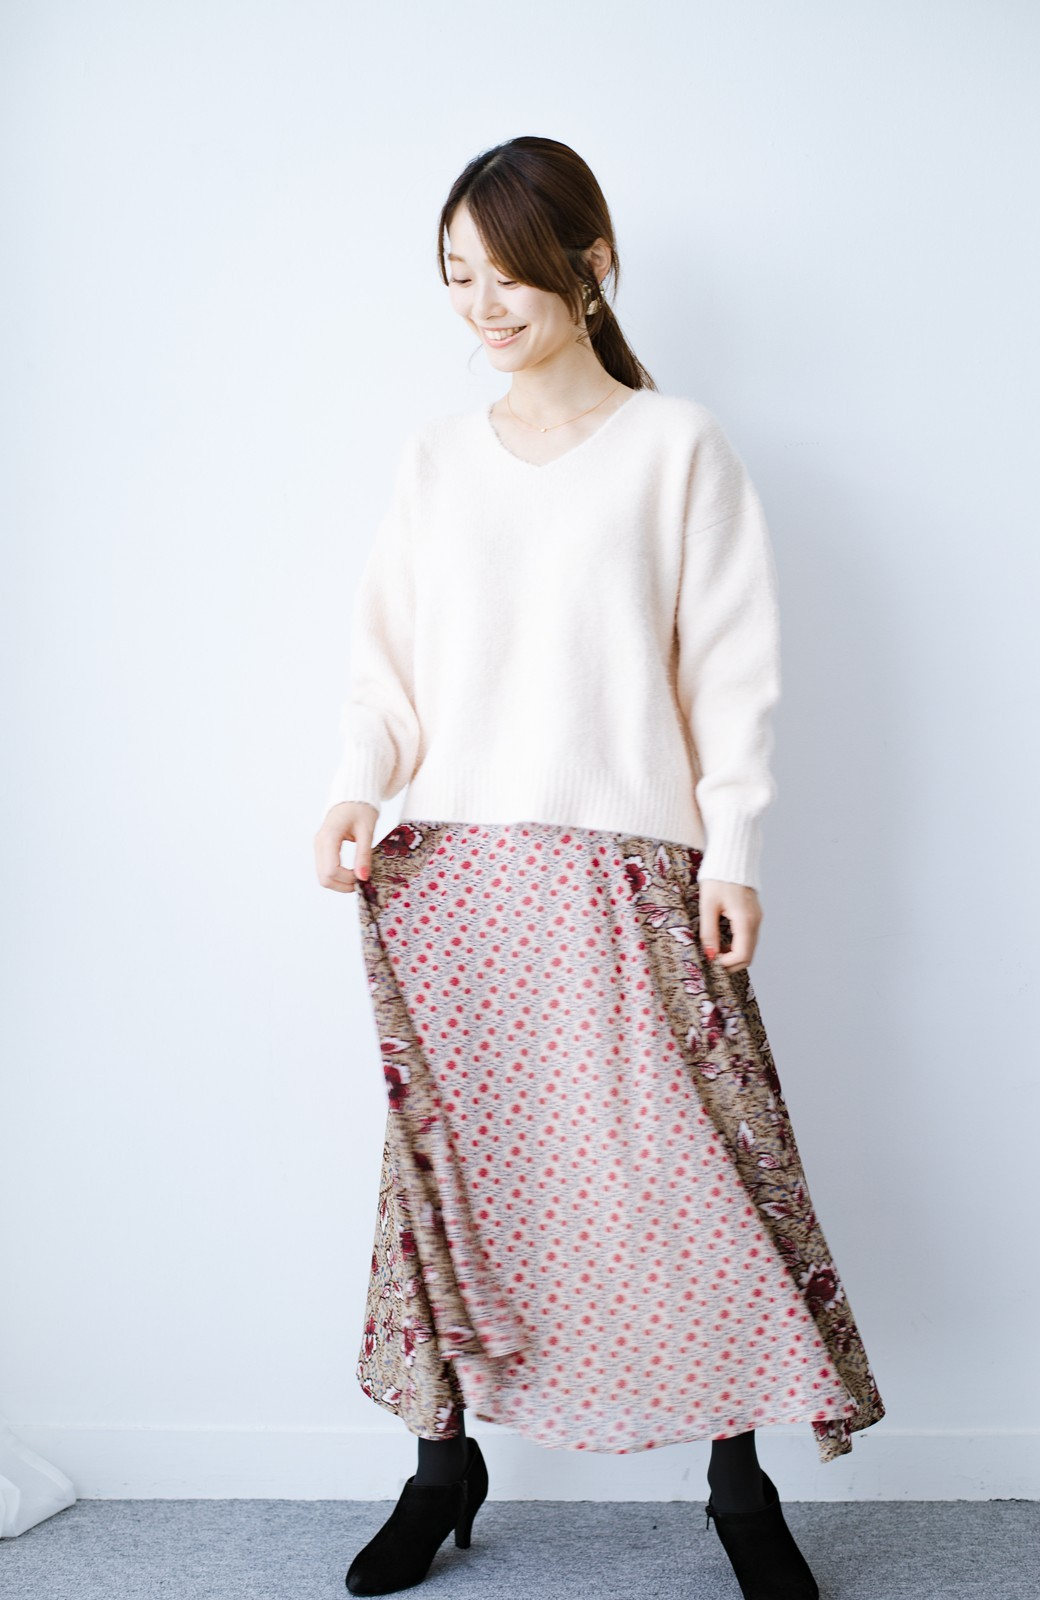 haco! 【洗濯機洗いOK】シンプルなトップスに合わせるだけでかわいくなれる MIX柄スカート <ベージュ系その他>の商品写真21